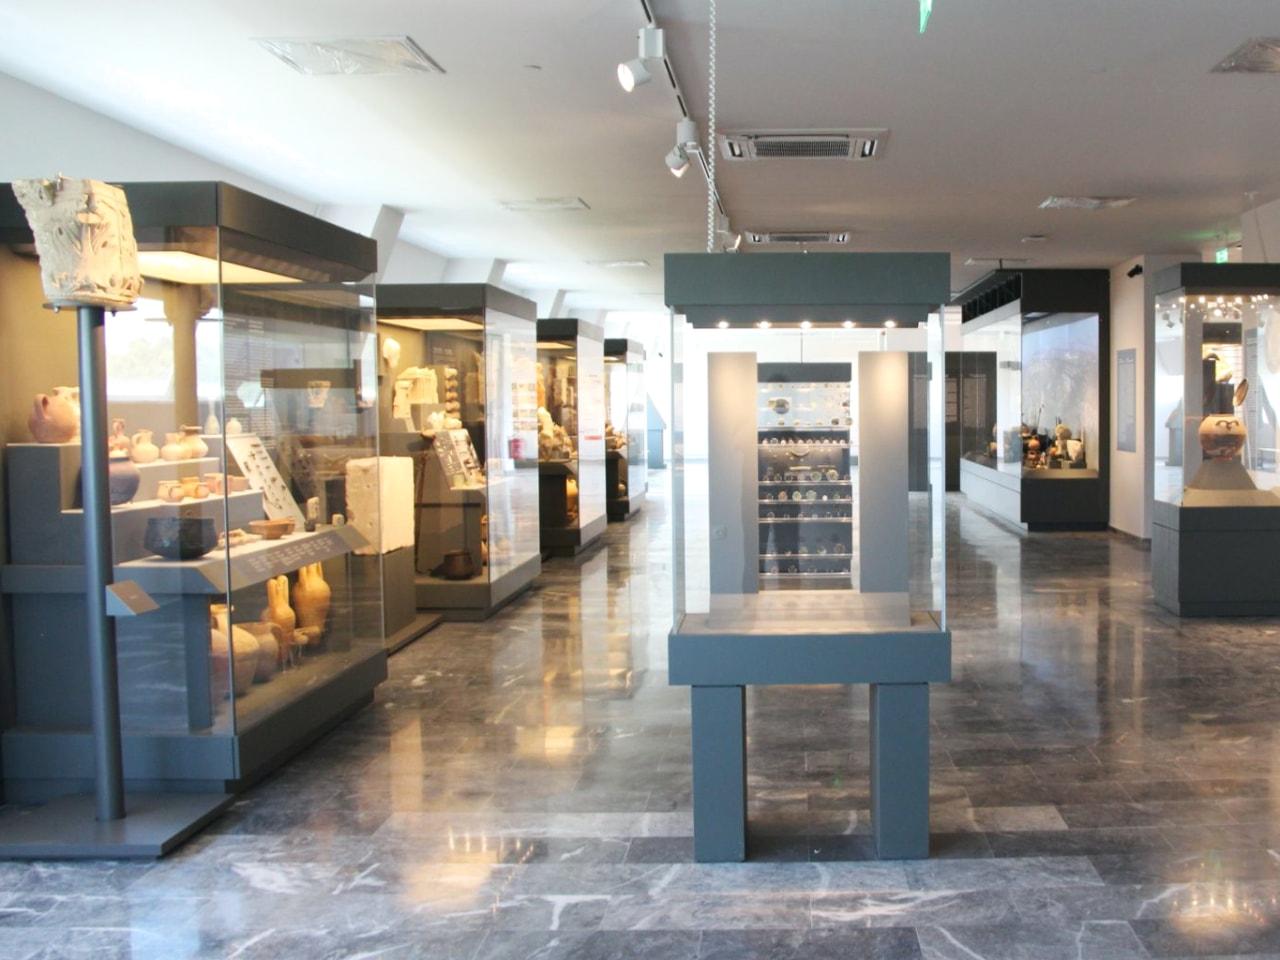 Museum Of Ancient Eleutherna In Rethimno Crete, activities rethimno crete, Museum Of Ancient Eleutherna In Rethymno Crete, excavation eleftherna crete, archaeological site elefhterna crete